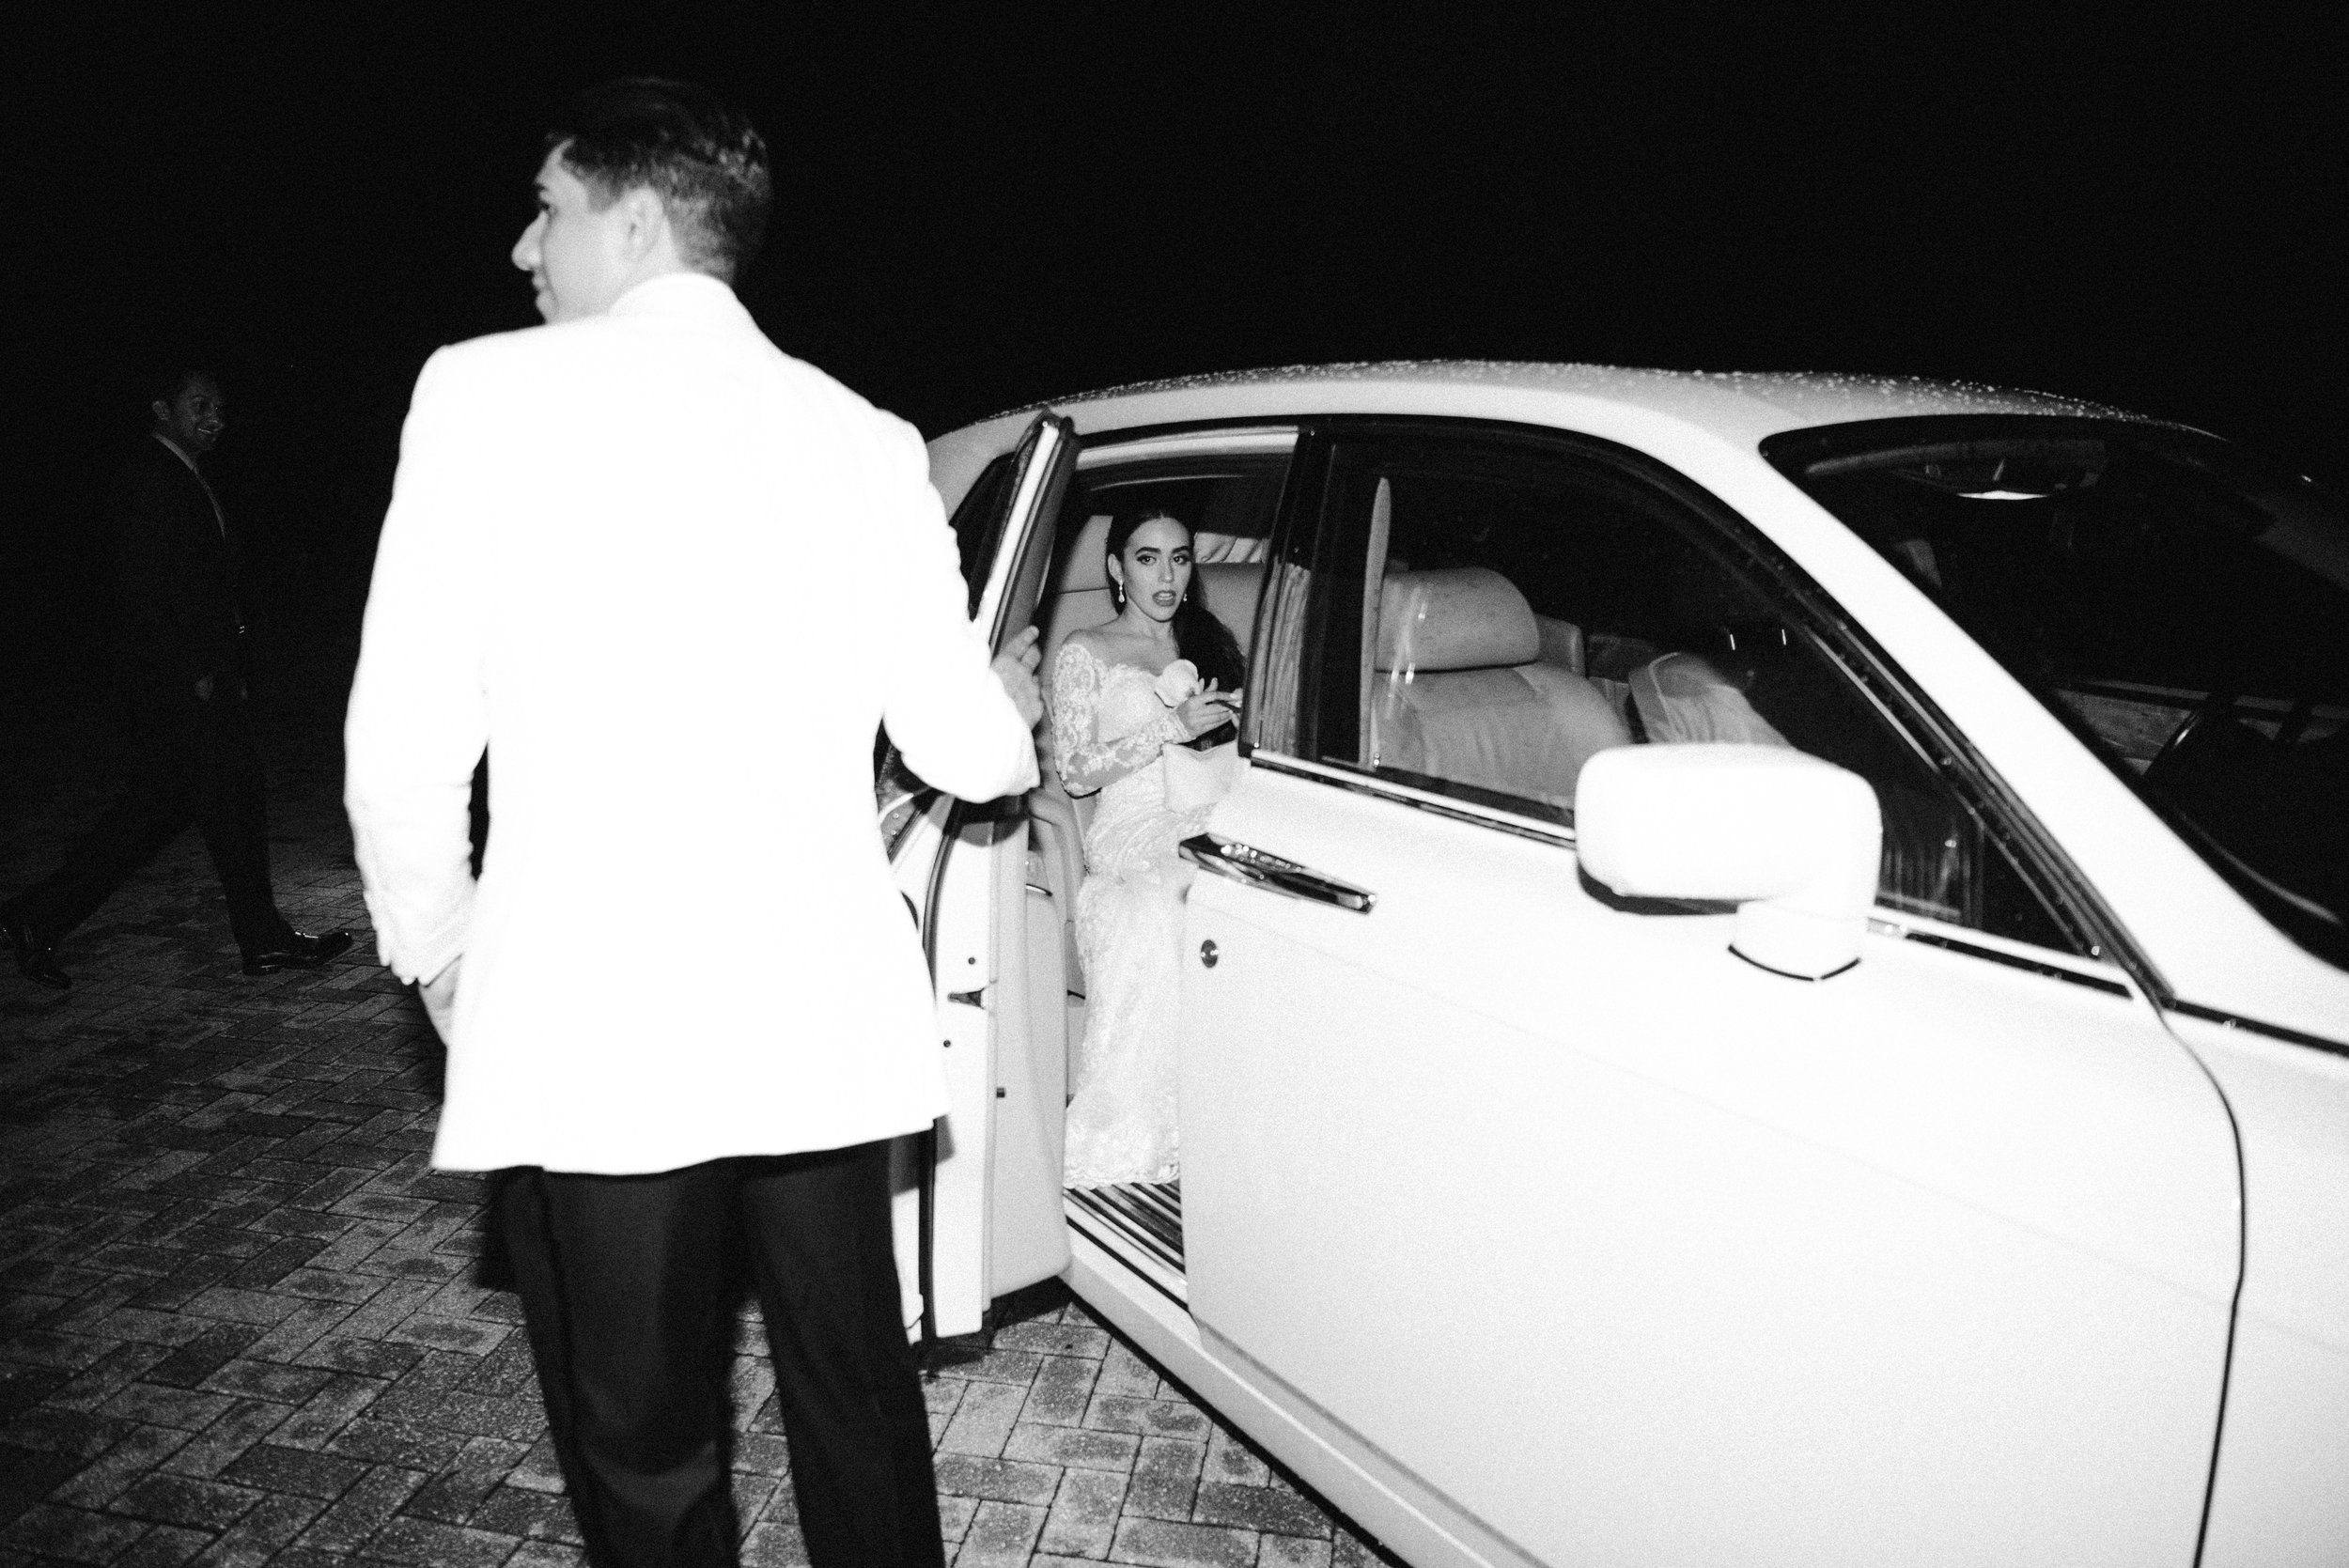 lis-paul-collado-luxmore-grande-wedding-932.jpg